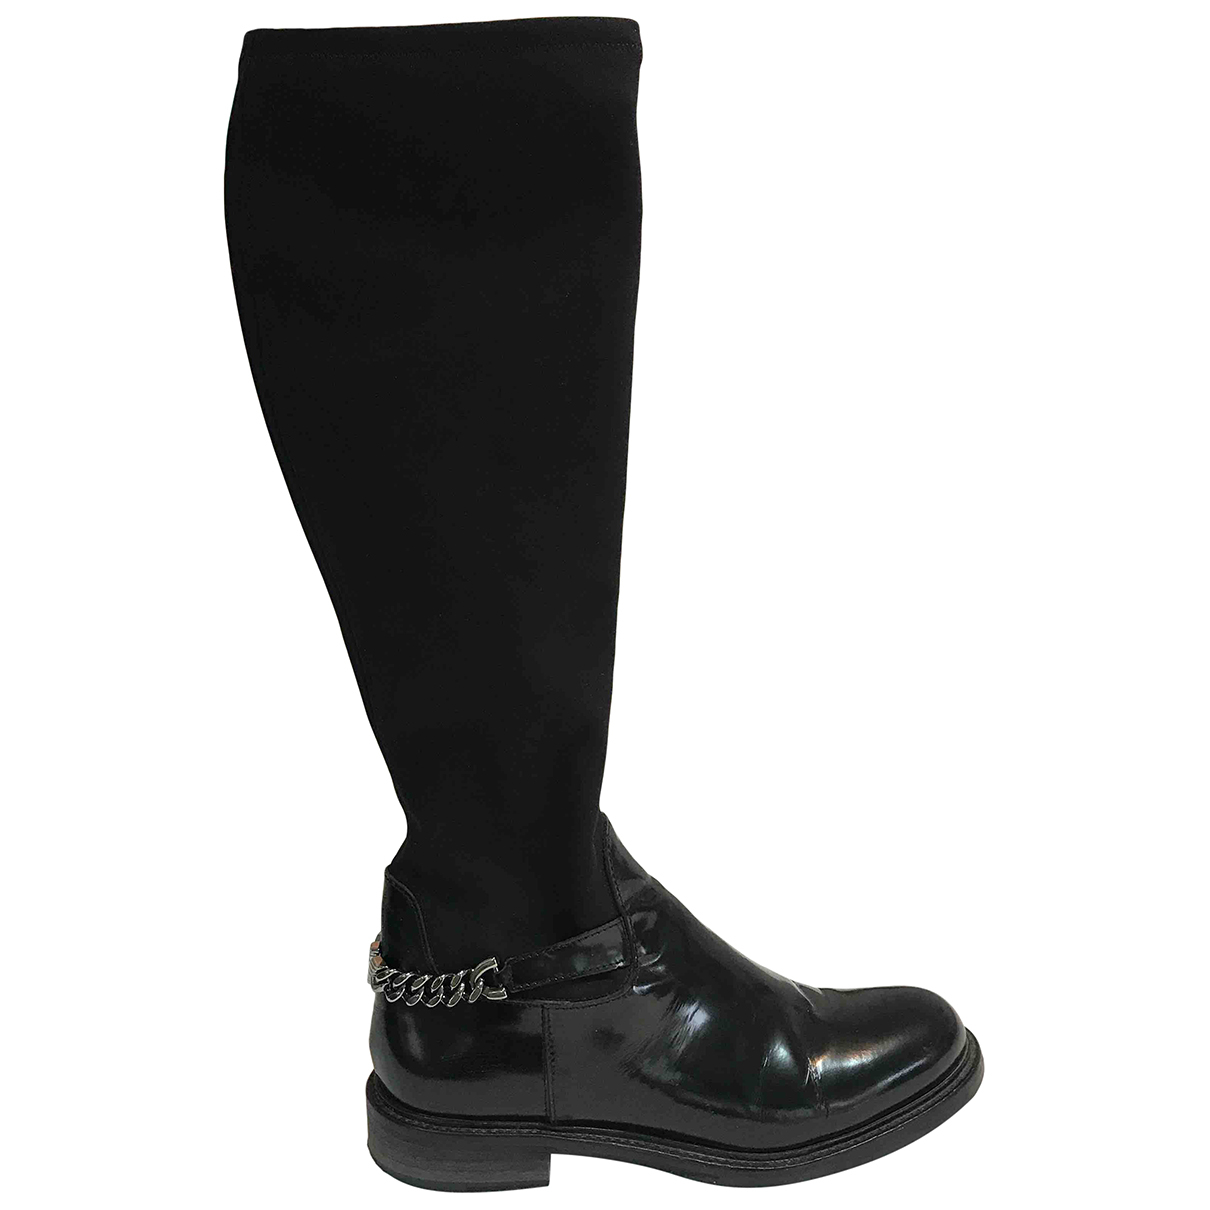 Emporio Armani N Black Leather Boots for Women 37.5 EU